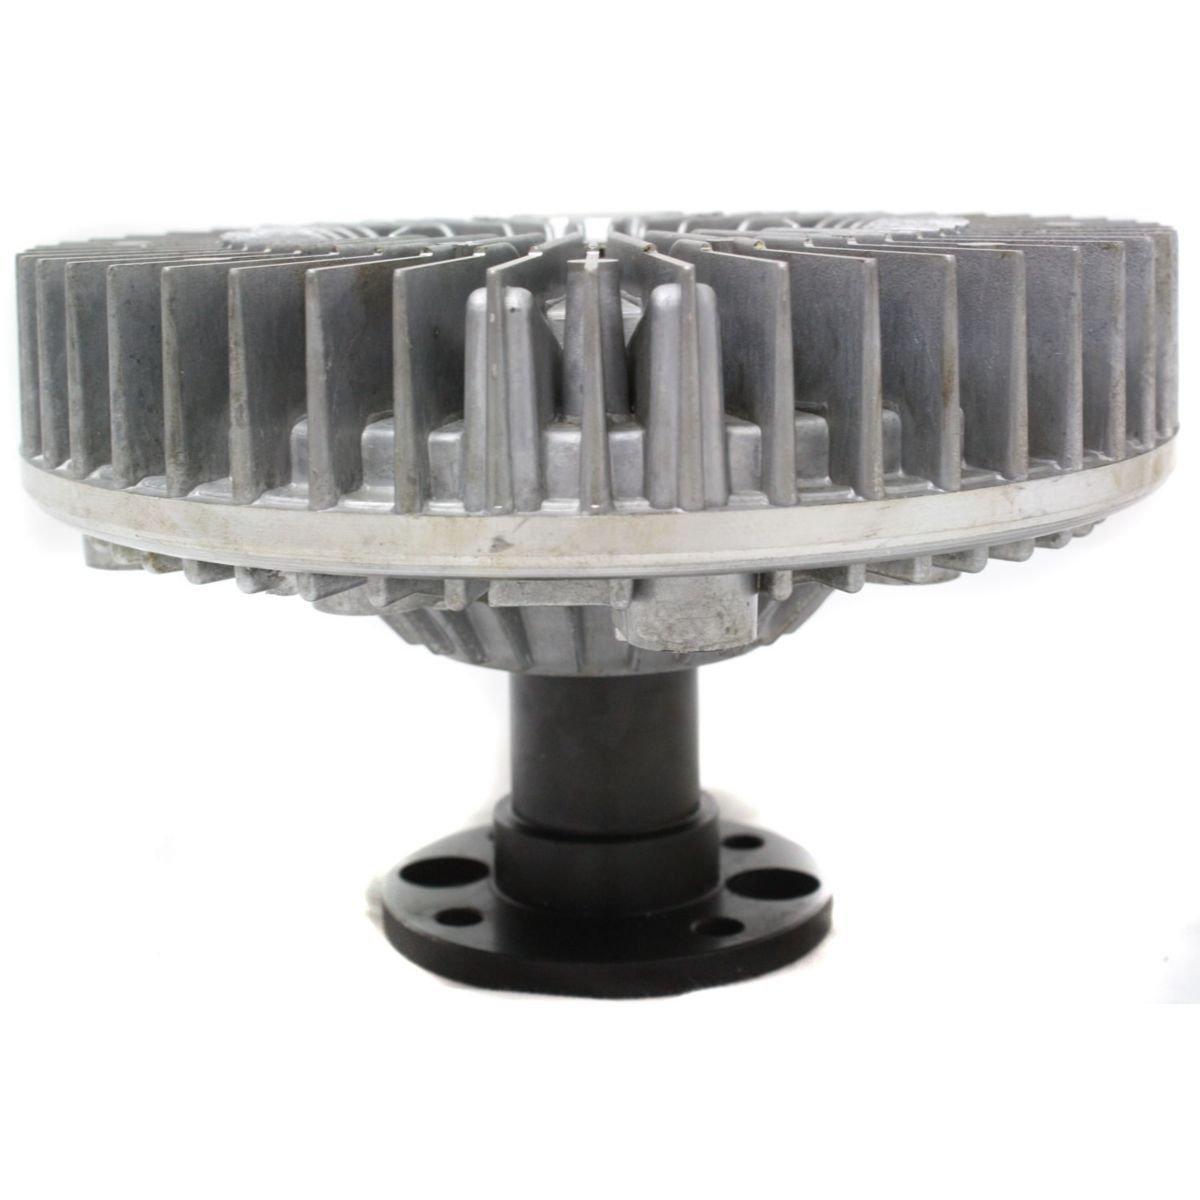 CPP Single Radiator Fan Shroud for 1996-2000 Nissan Pathfinder NI3110106